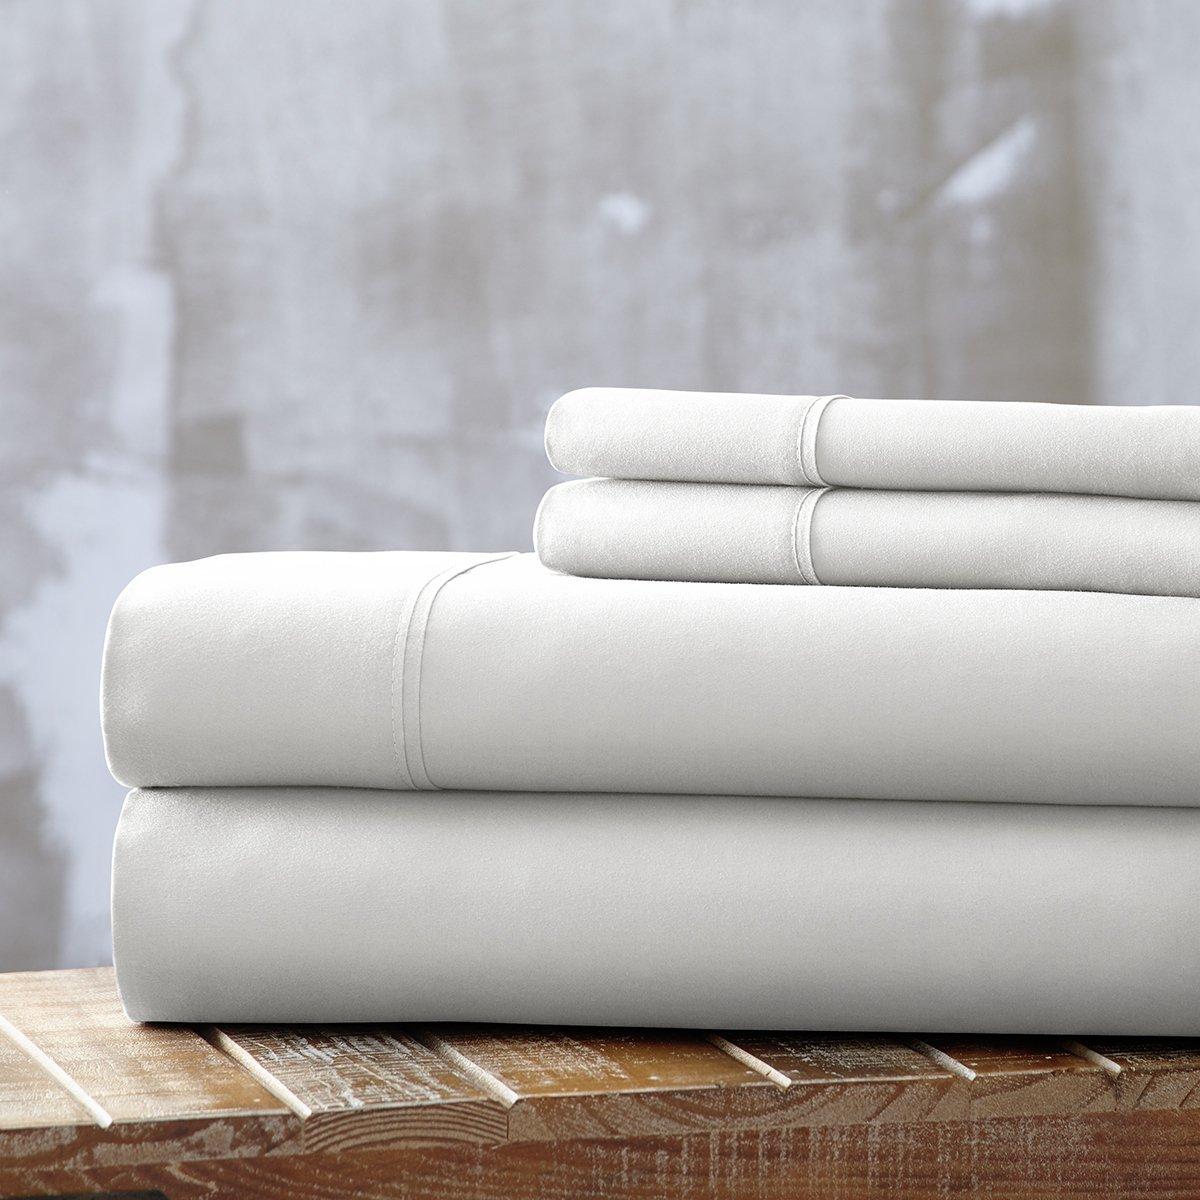 Spirit Linen, Inc Hotel 5th Ave EE-QUEEN-WHITE-4PC Queen White Everyday Essentials 1800 Series 4Pc Sheet Set